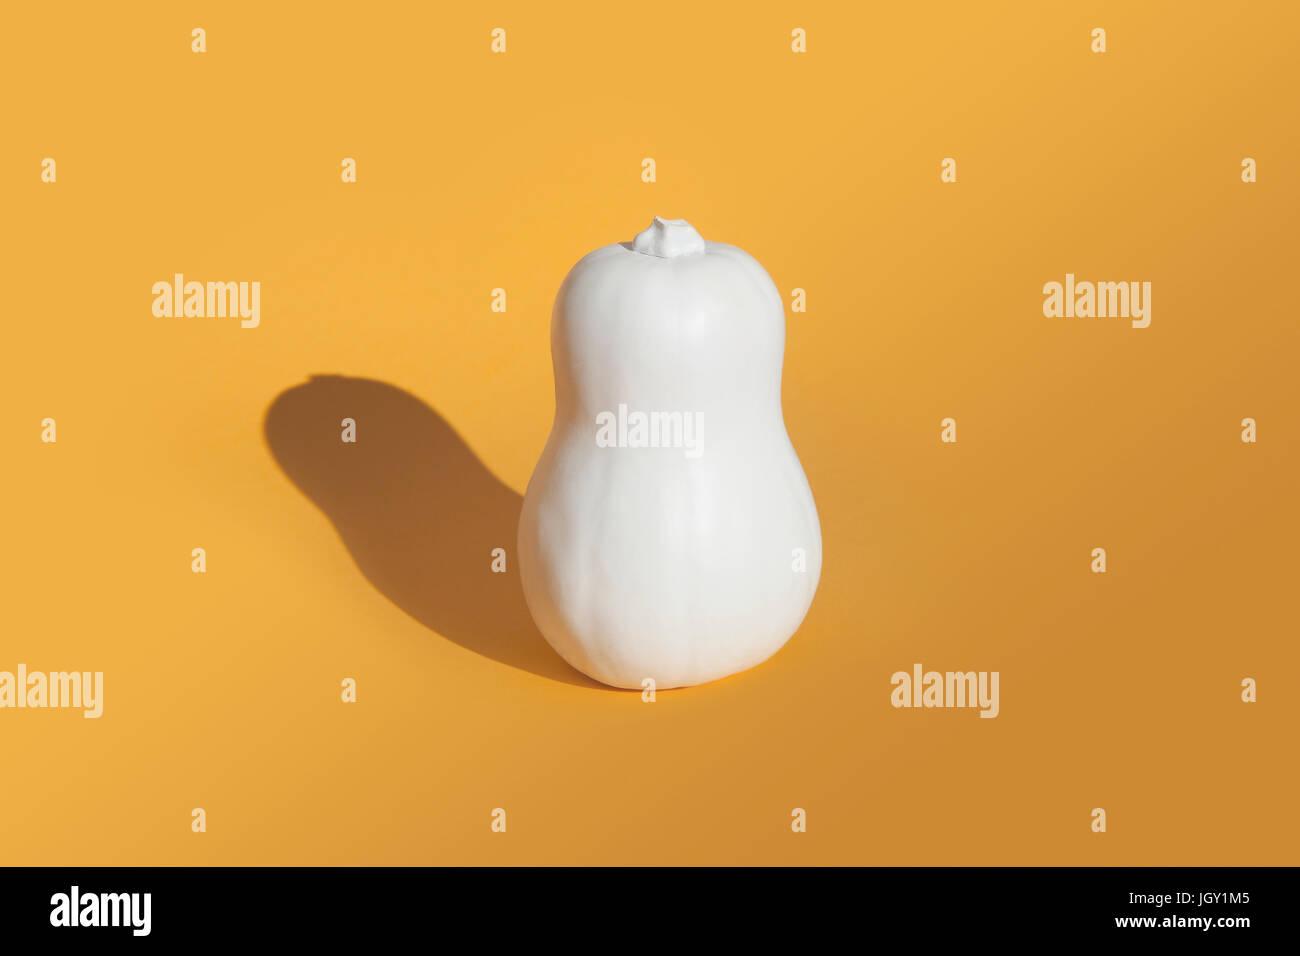 Calabacita pintados de color blanco sobre fondo naranja Imagen De Stock